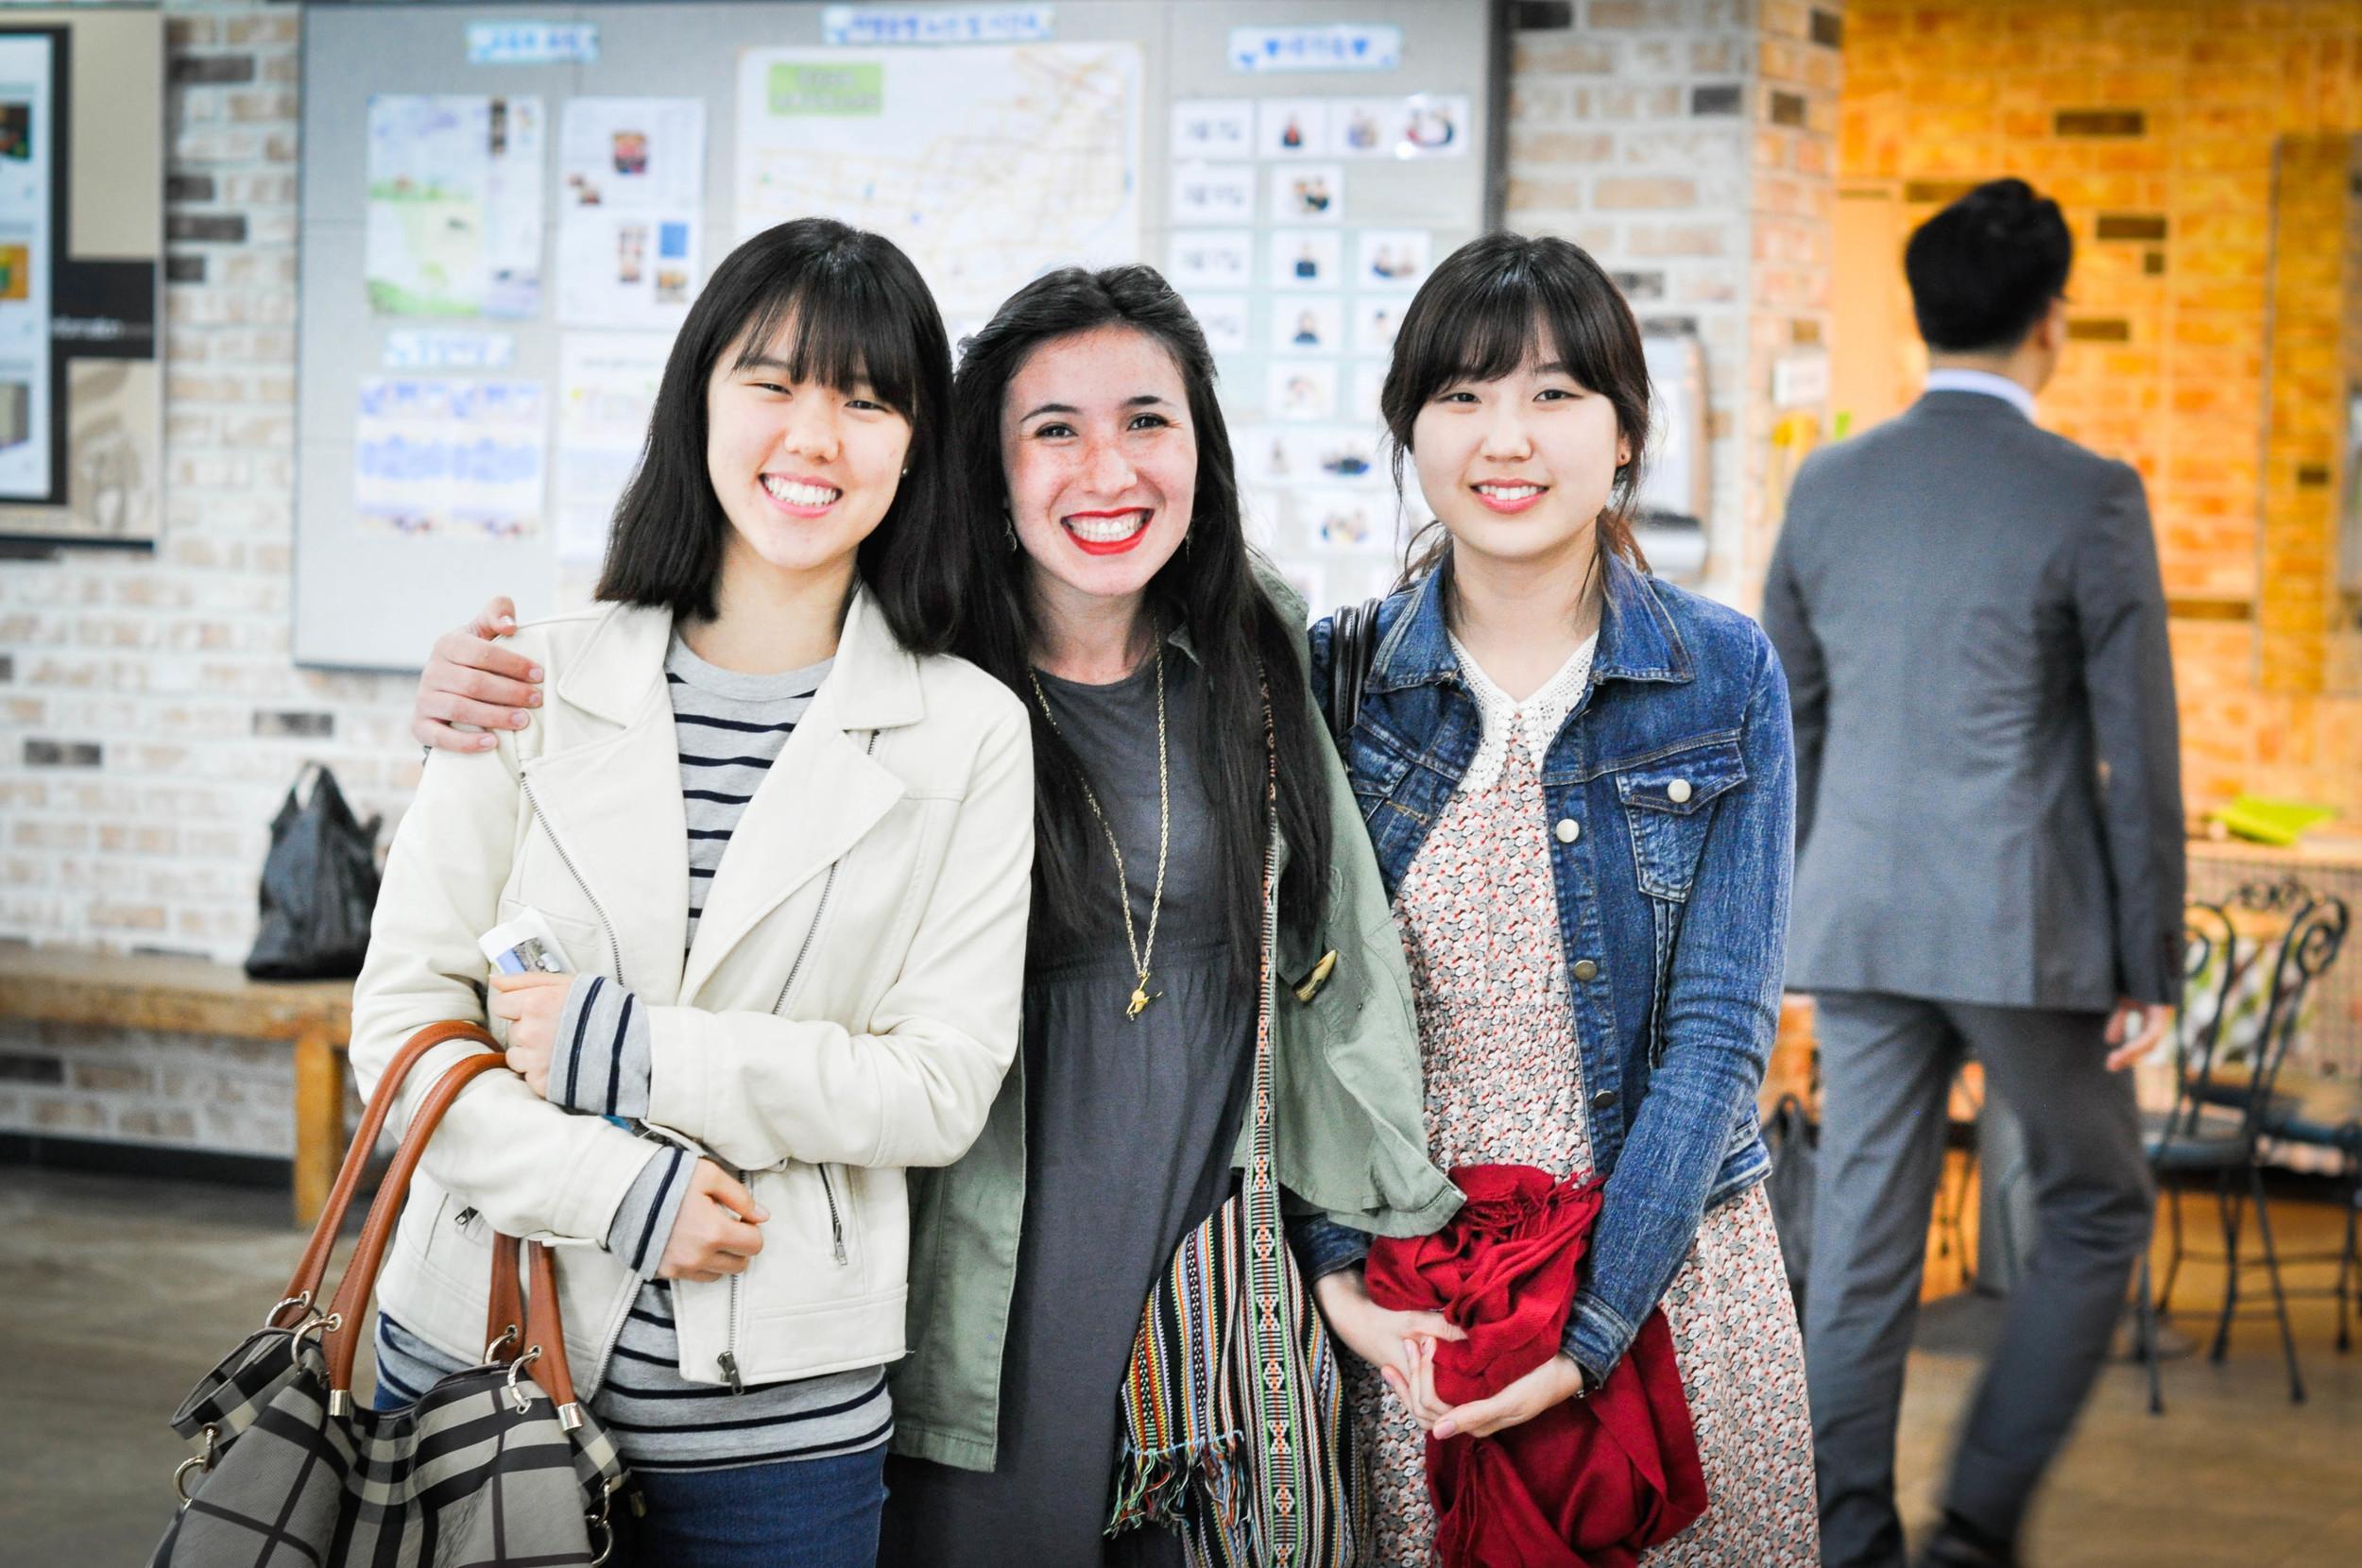 Small group in Hongik Church. Seoul, Korea.